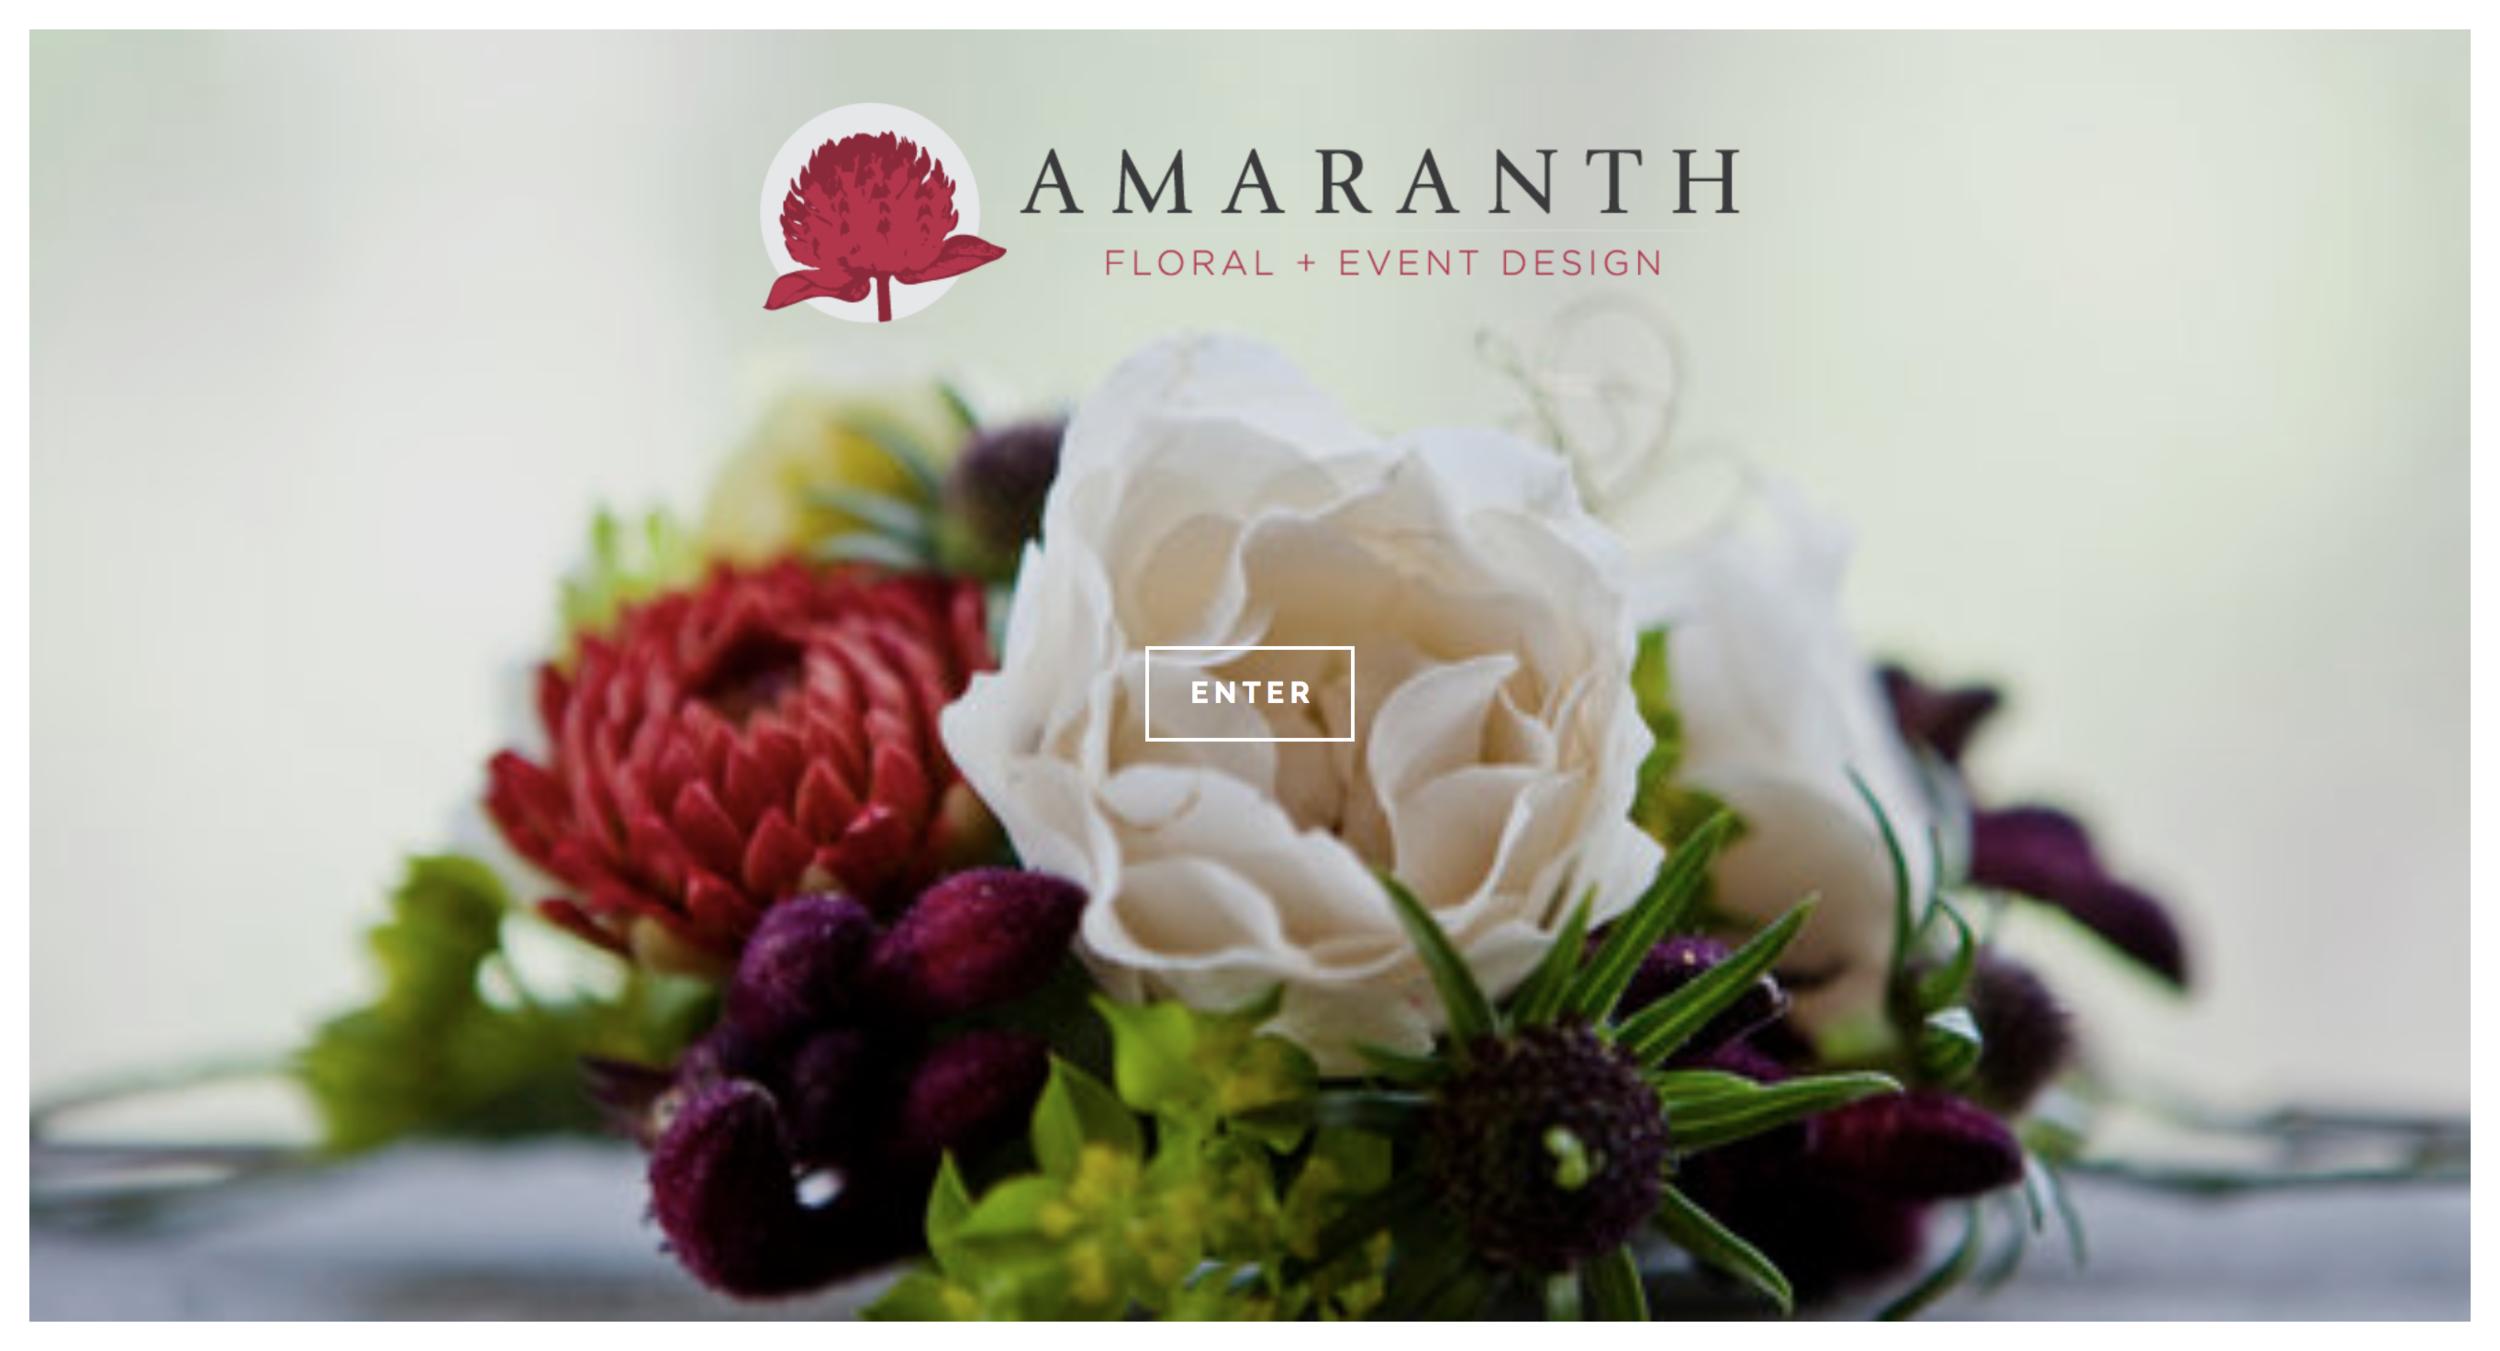 Amaranth - Launch.png